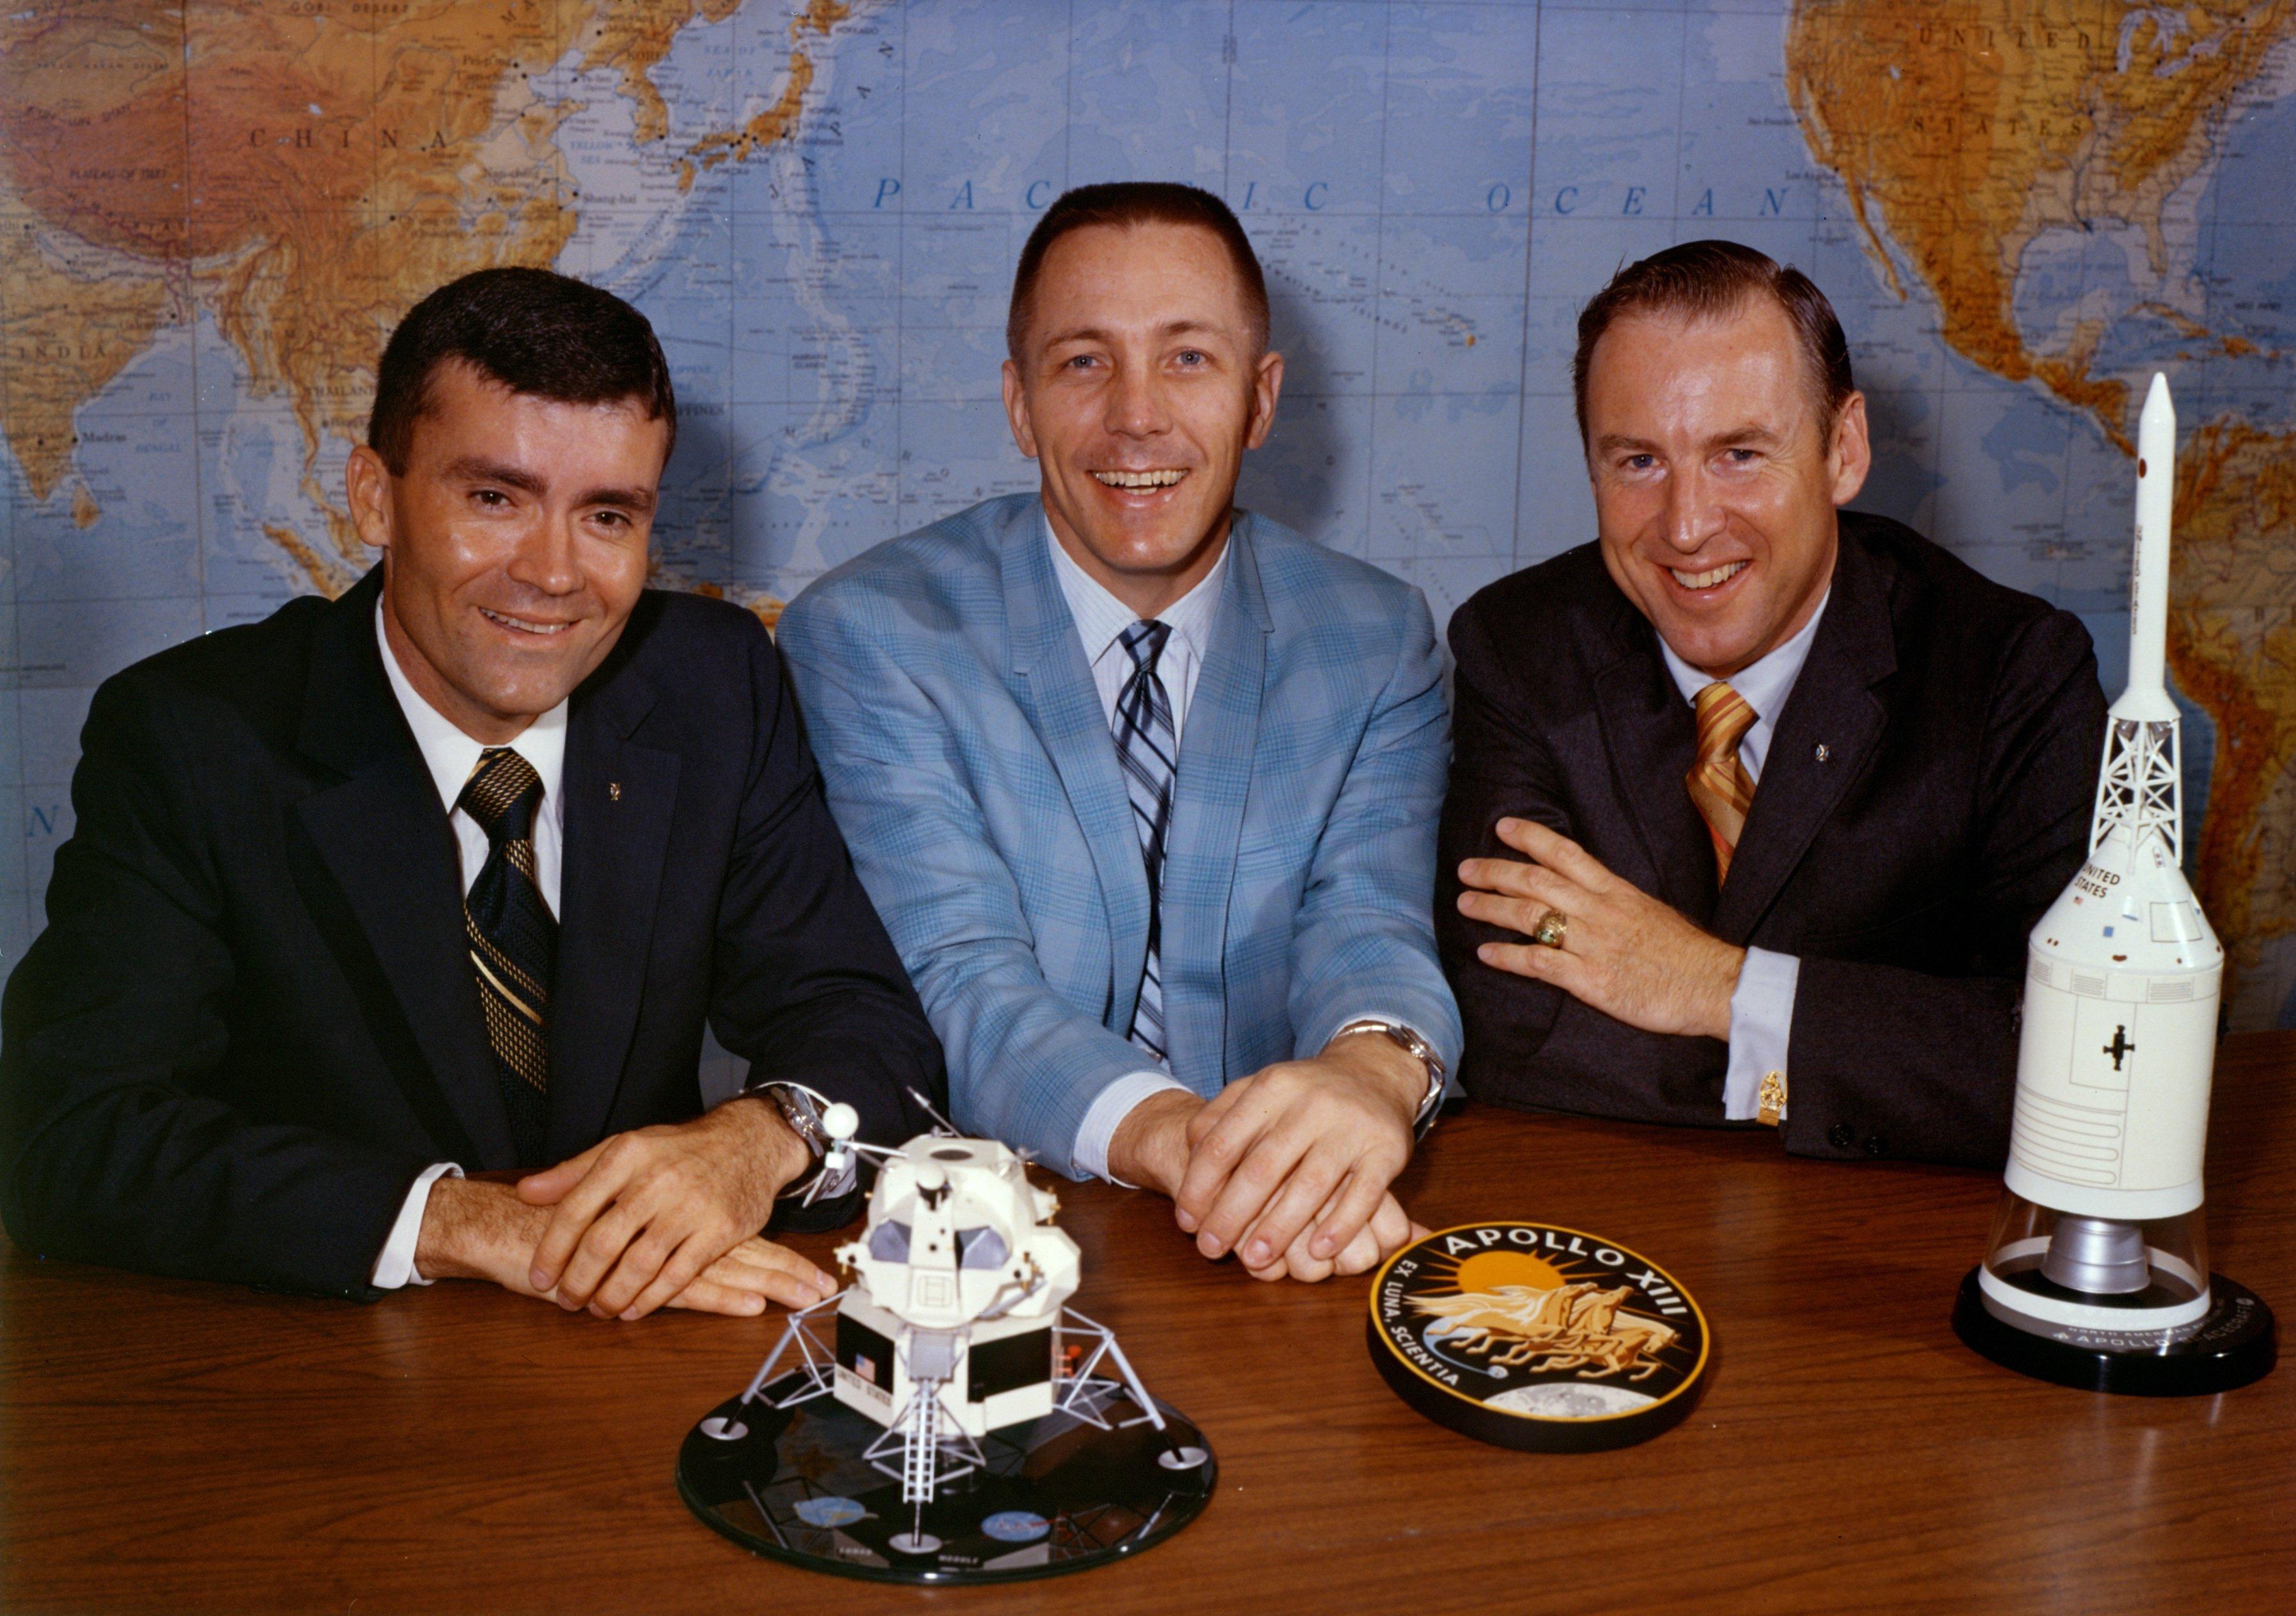 High Resolution Wallpaper | Apollo 13 3592x2528 px